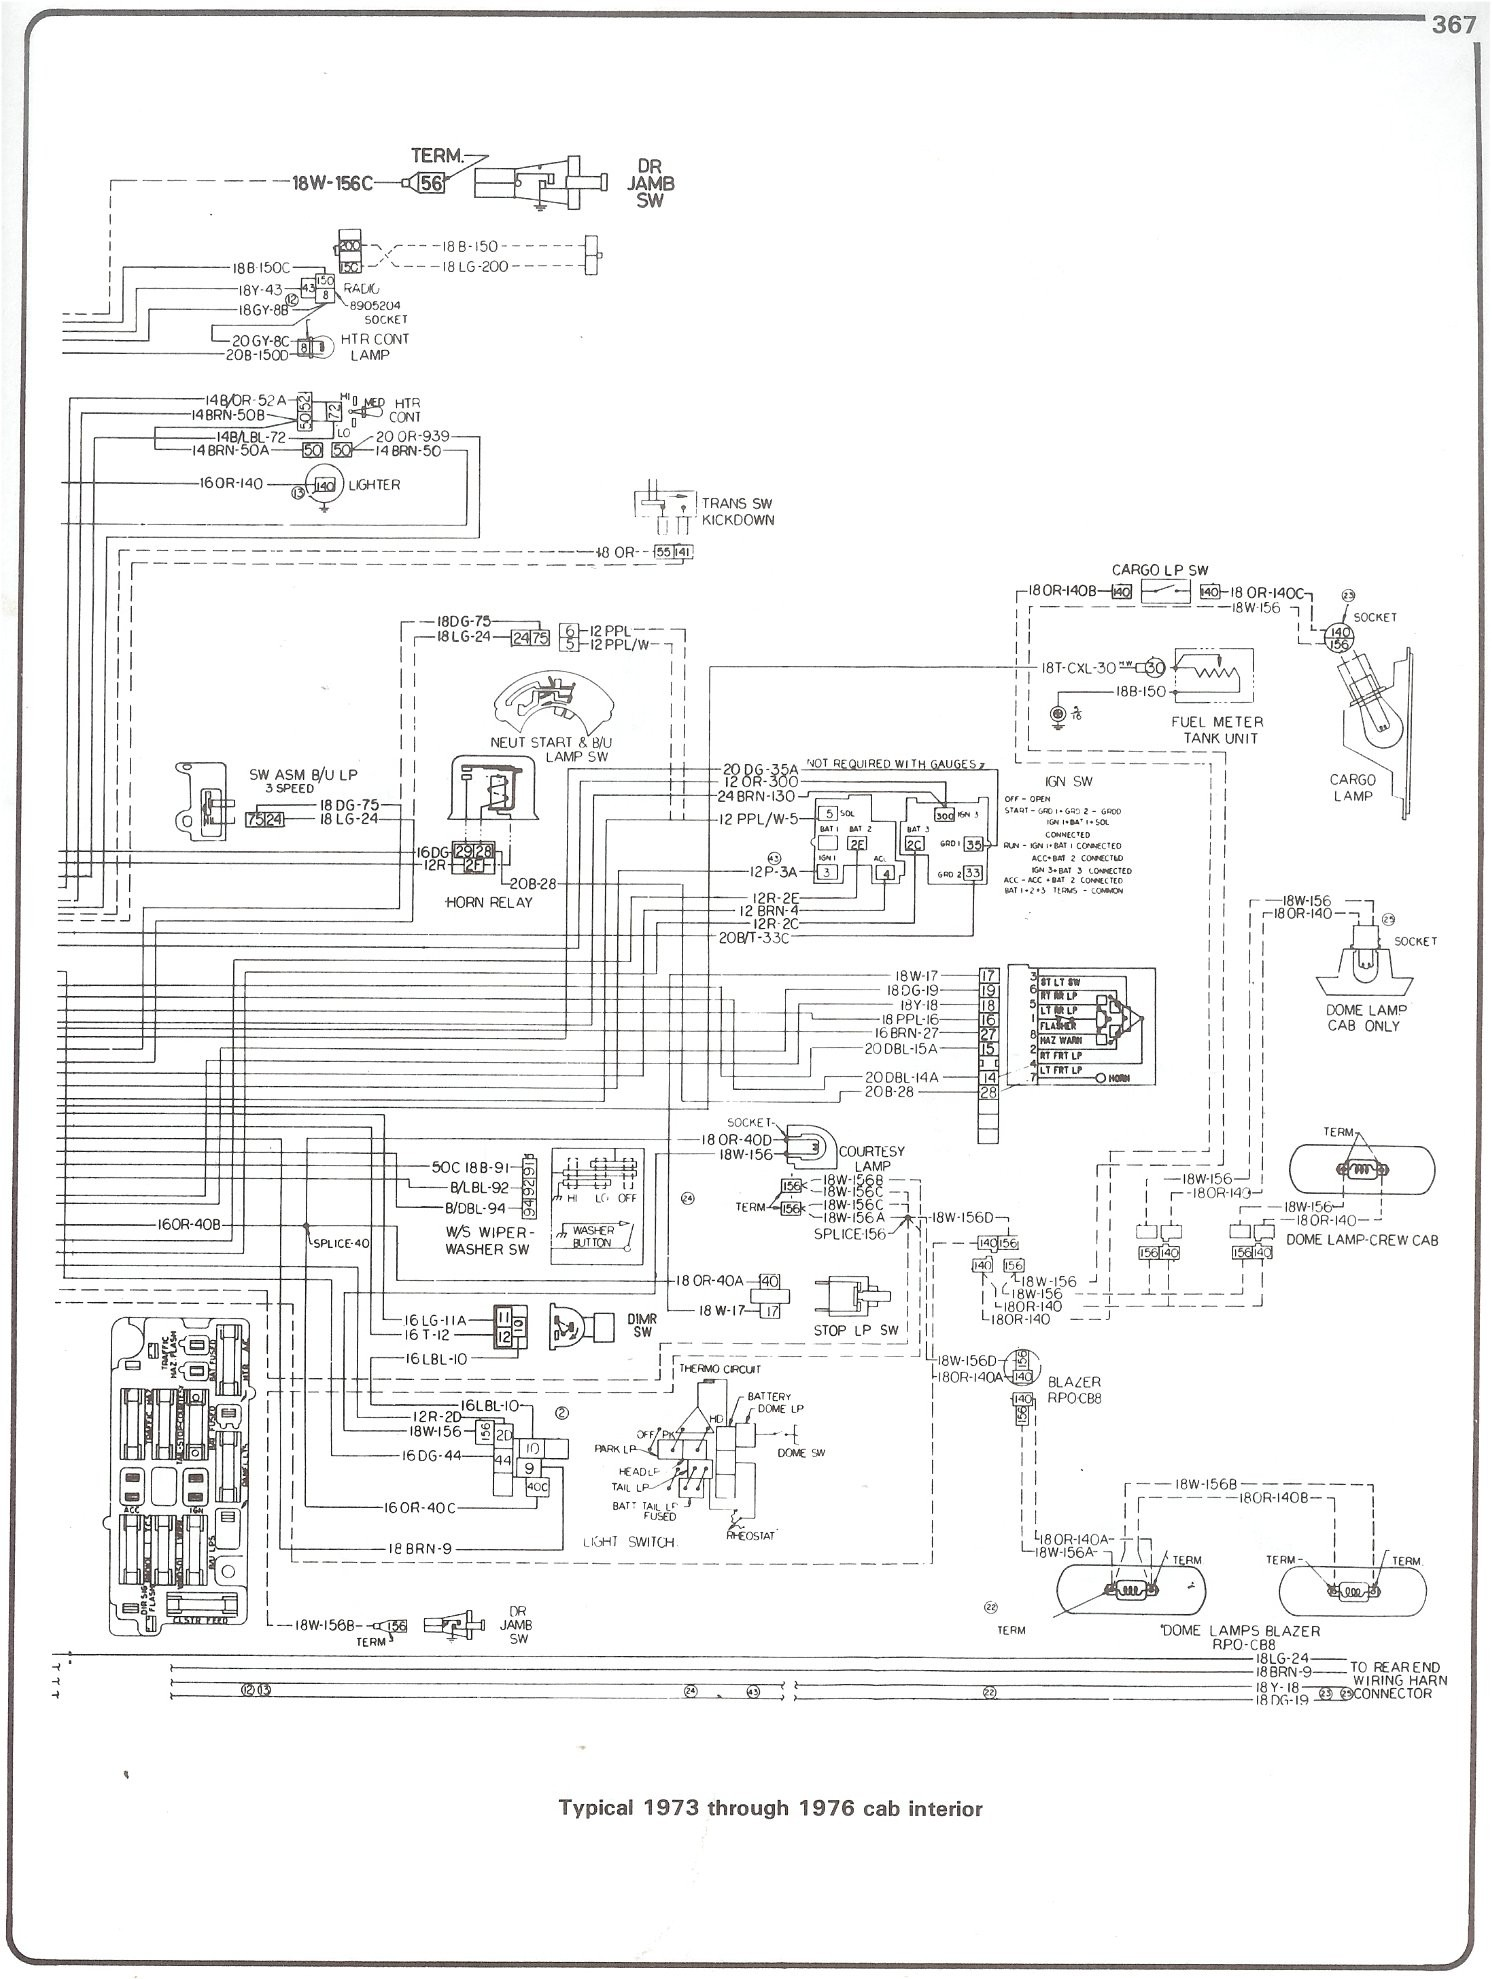 Wire Diagram for Inverter In A 2010 Tiffin Phaeton Donsdeals Blog May 2018 Of Wire Diagram for Inverter In A 2010 Tiffin Phaeton